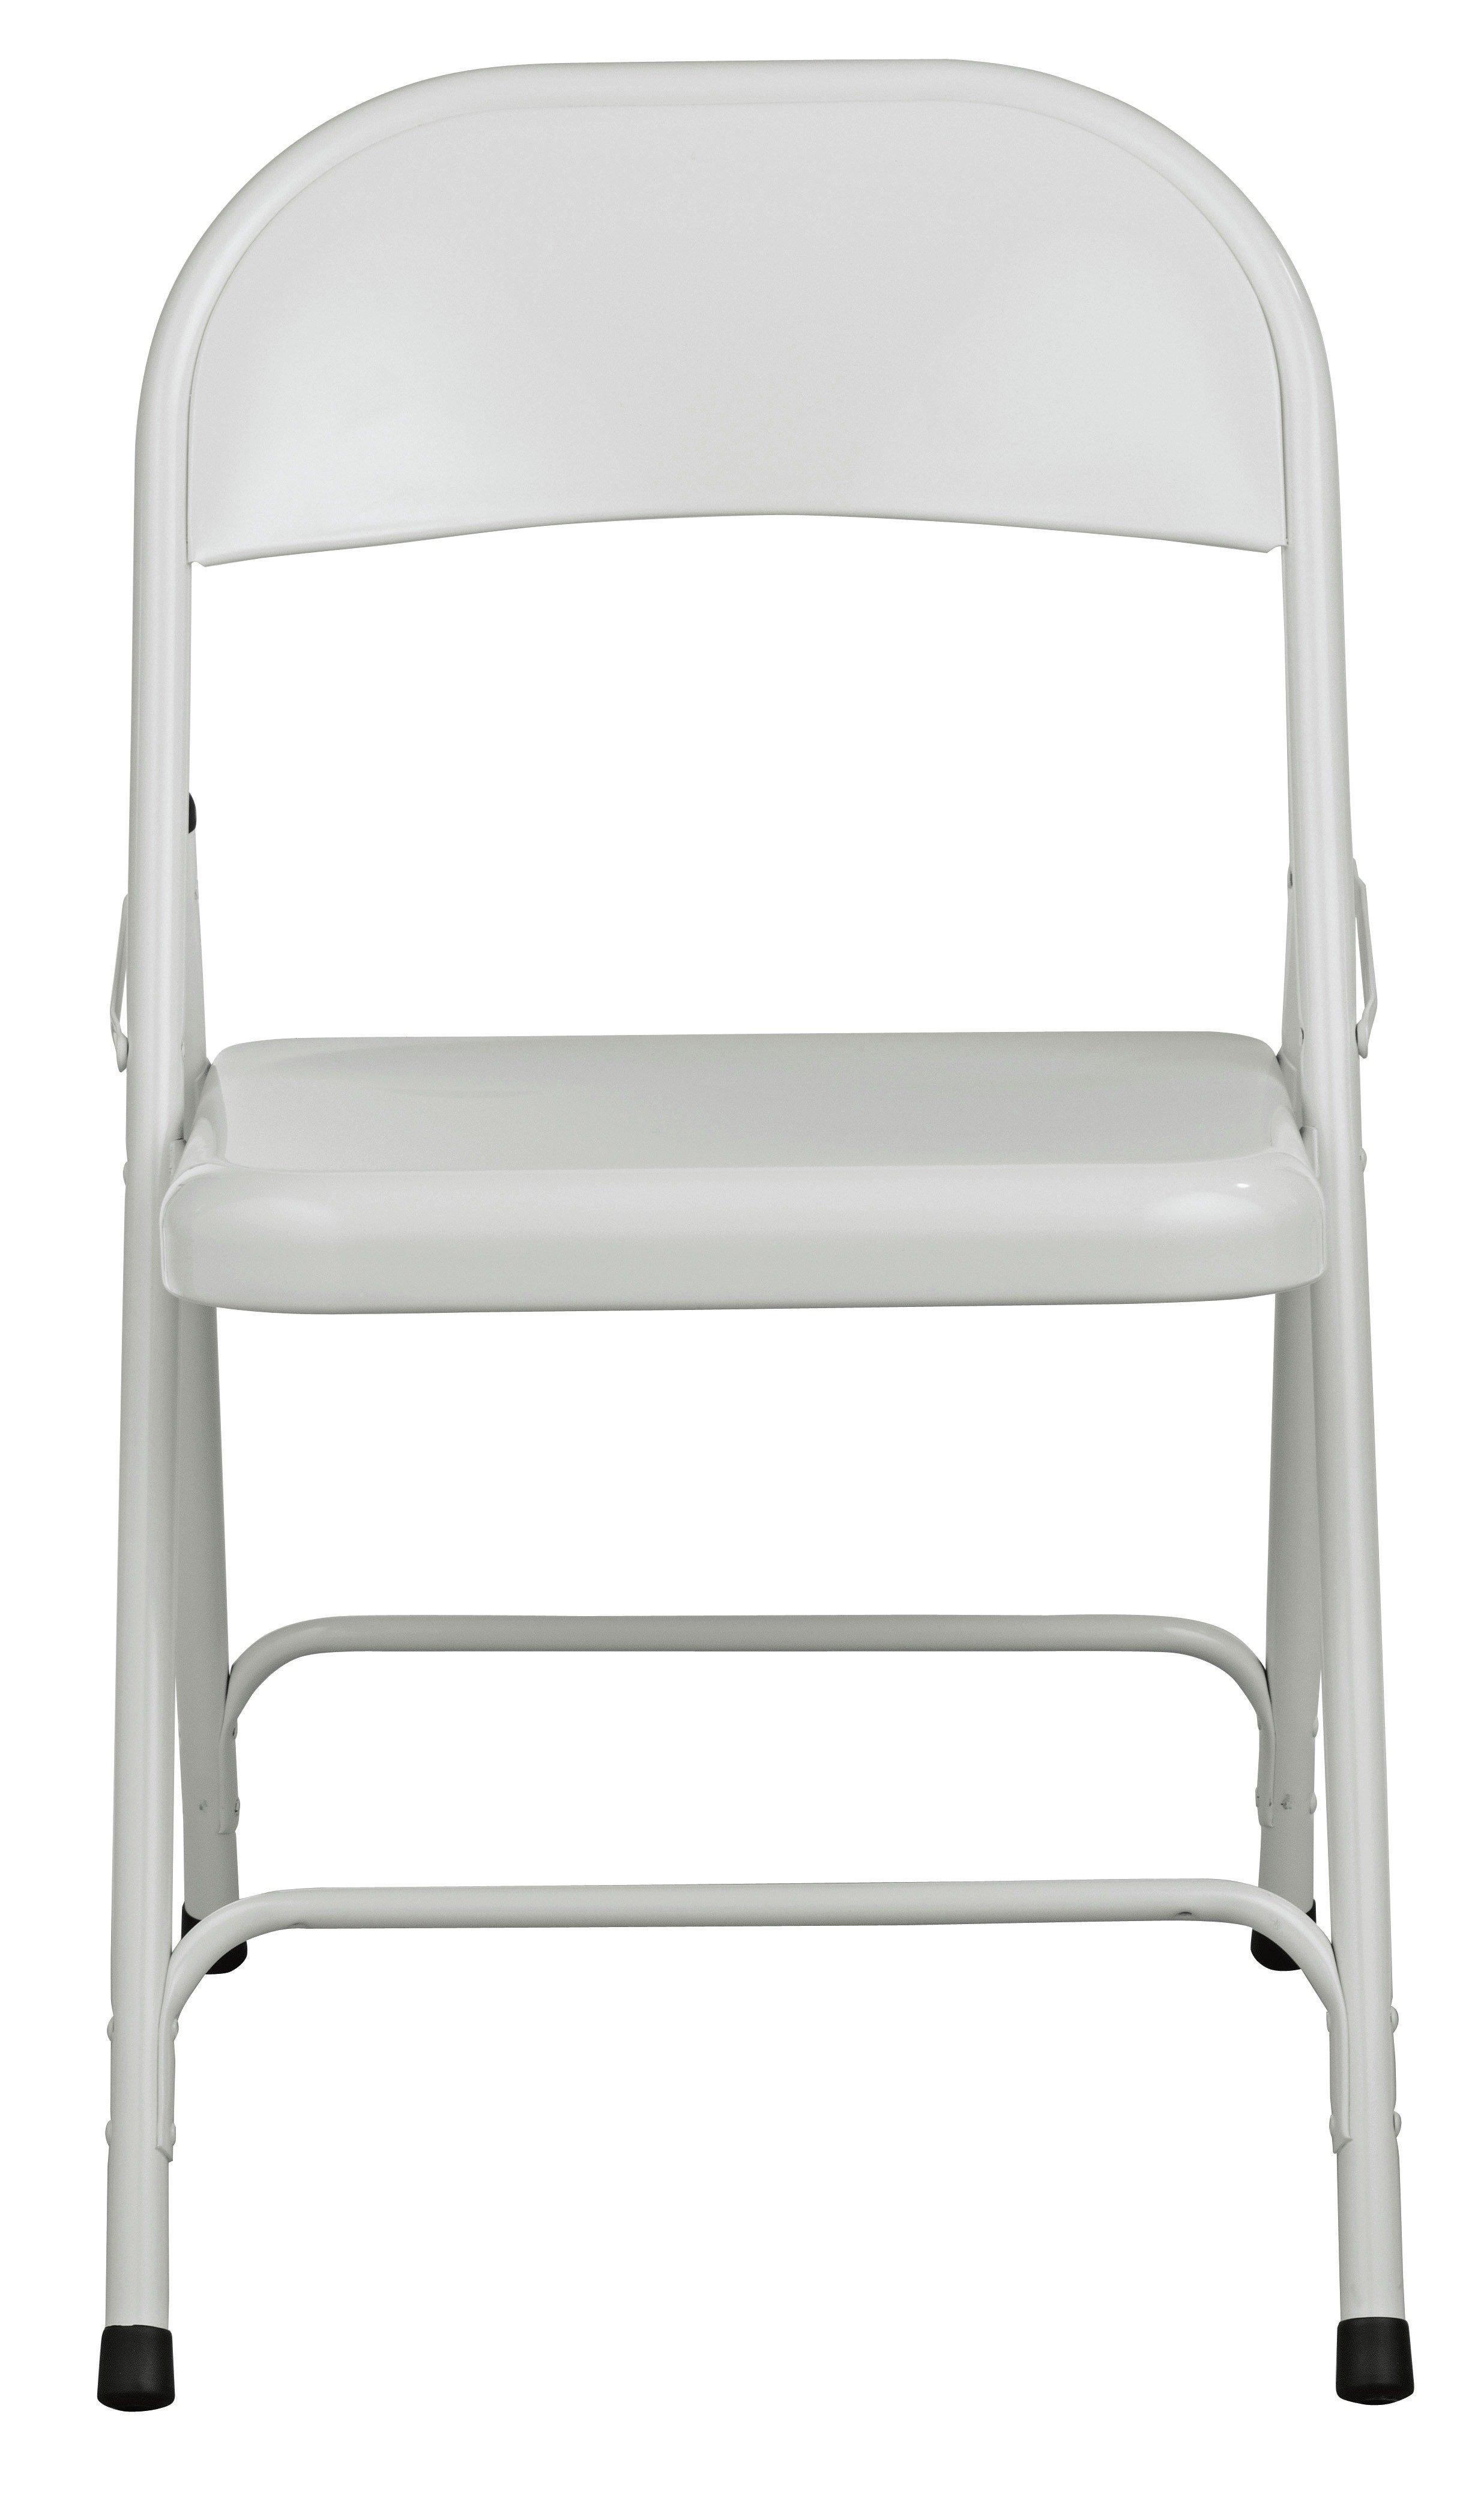 White Metal Folding Chairs buy habitat macadam metal folding chair - white at argos.co.uk